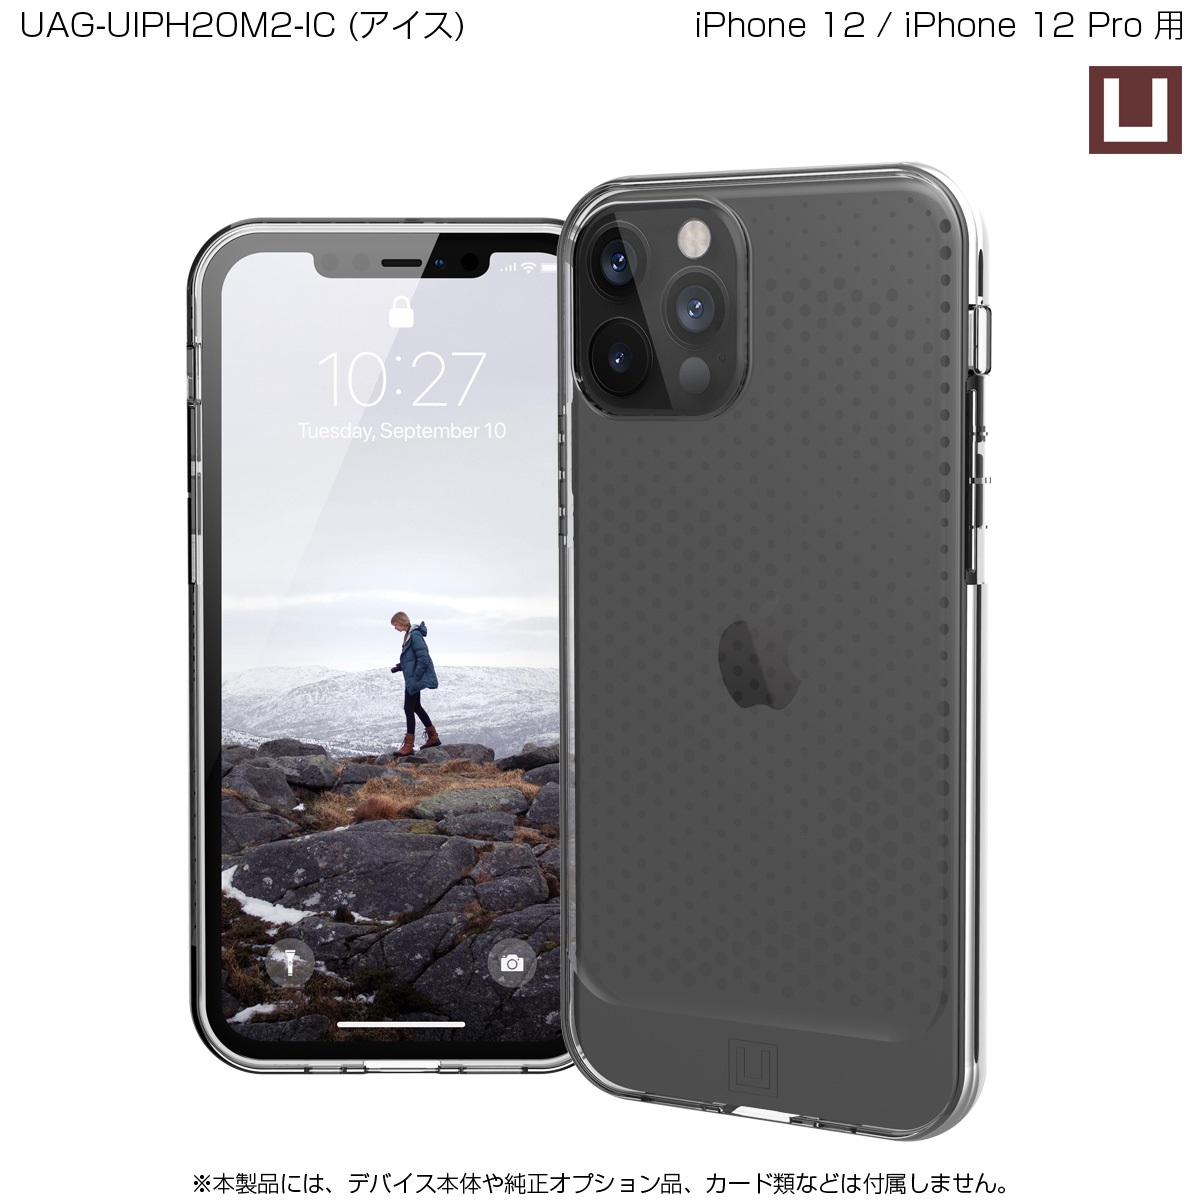 U by UAG iPhone 12 Pro/ 12用 LUCENTケース 全4色 耐衝撃 UAG-UIPH20M2シリーズ 6.1インチ